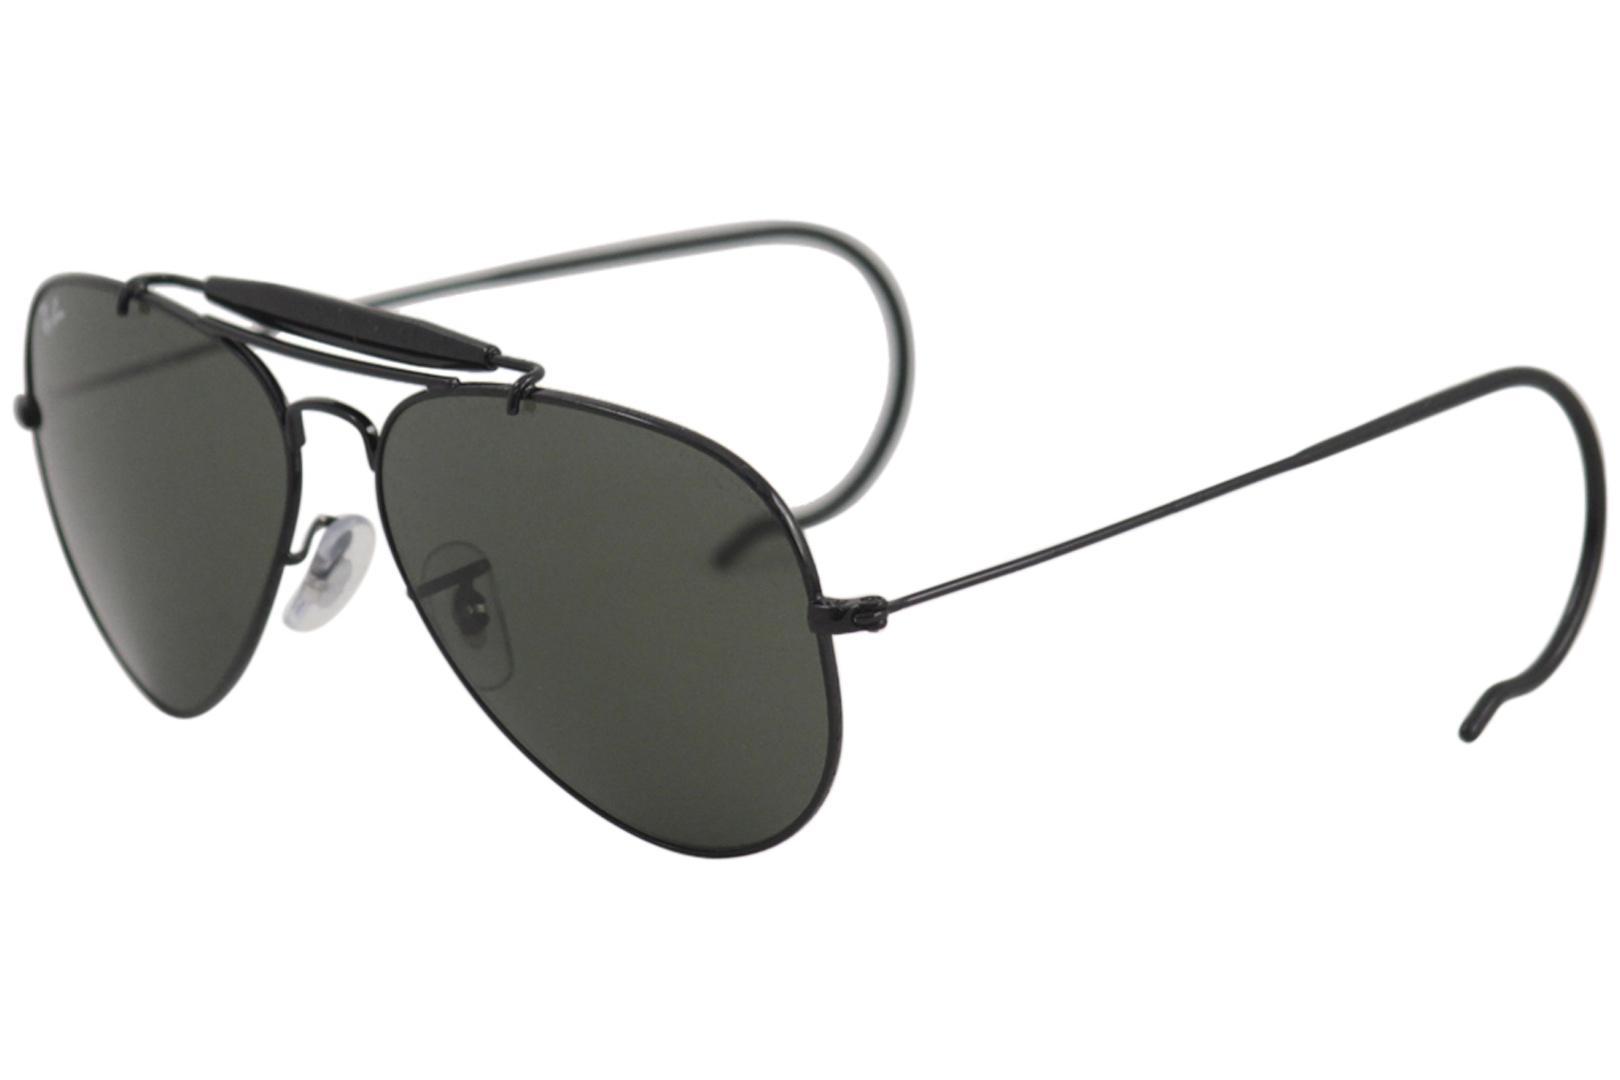 6c65e4c6cb RayBan Sunglasses Ray Ban Outdoorsman 3030 L9500 Black Shades